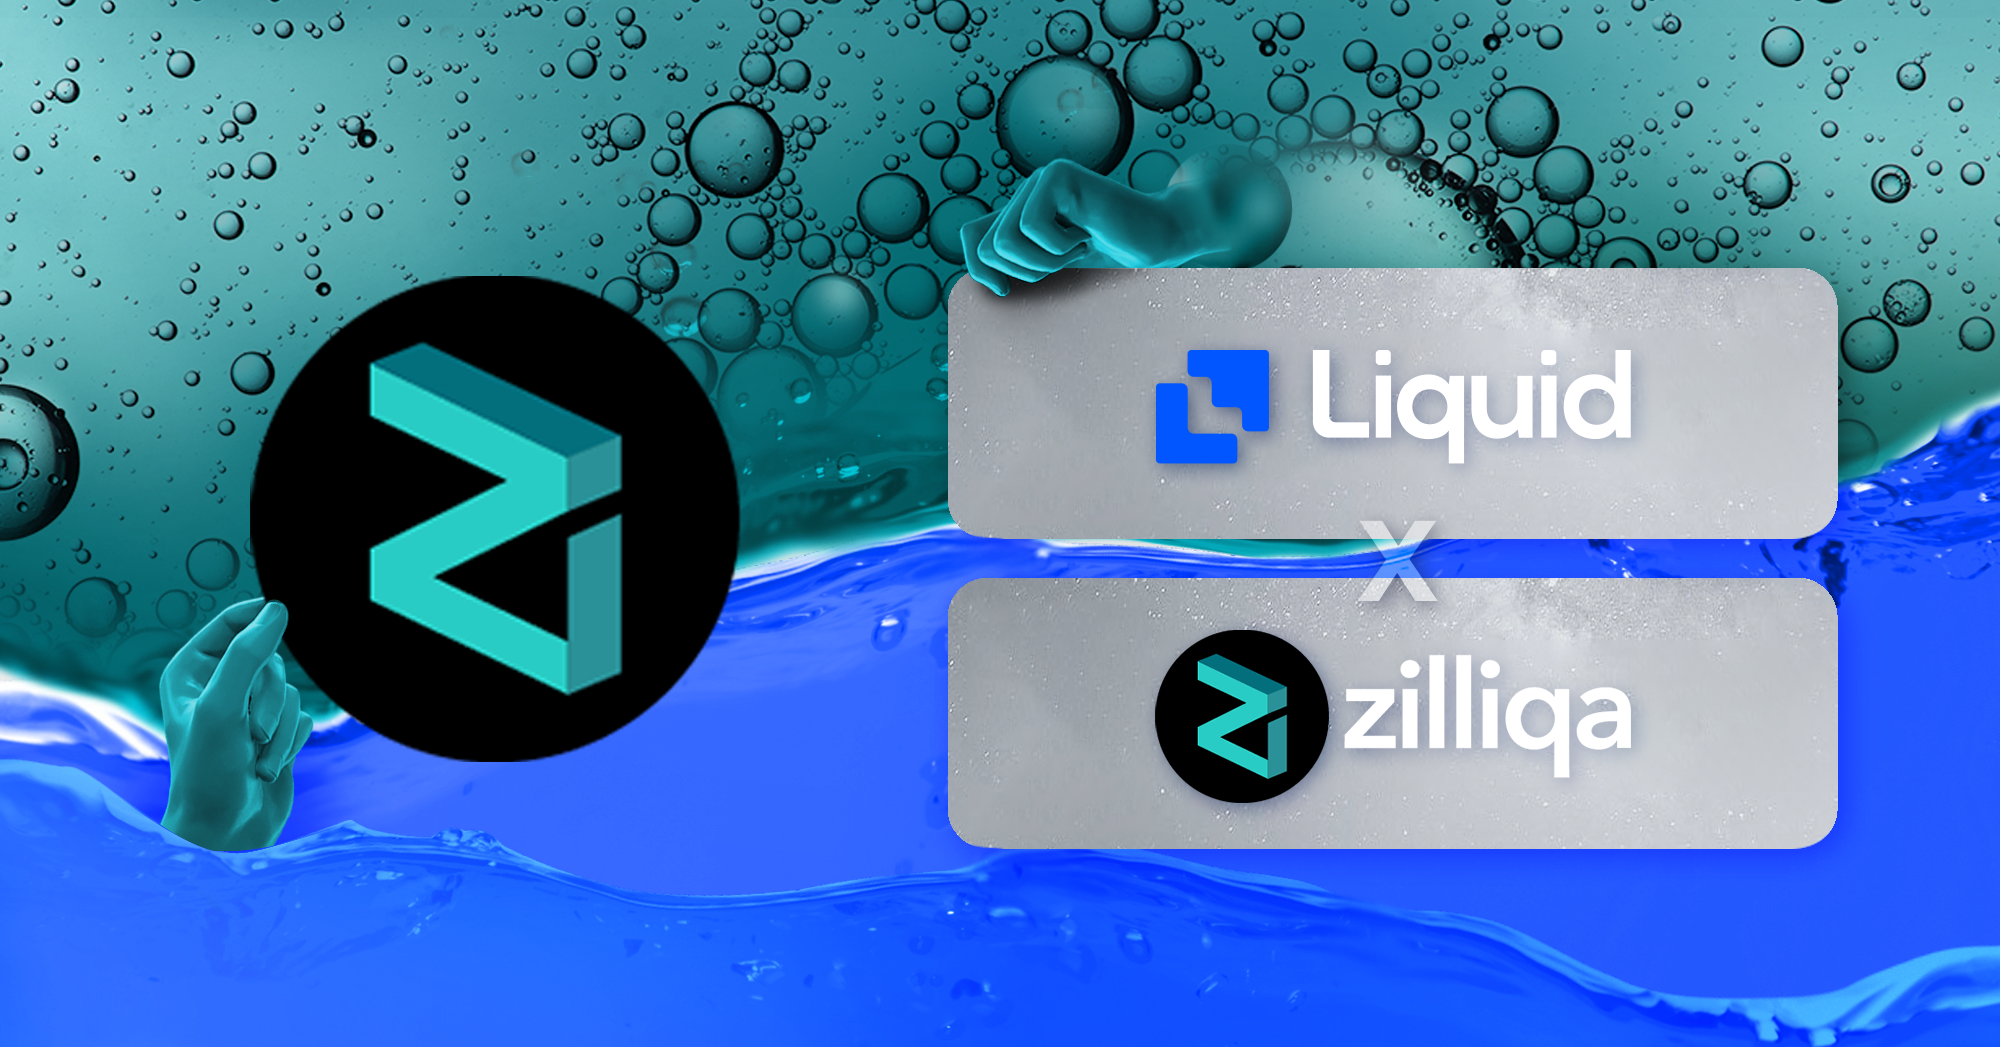 Zilliqa ZIL token listing on Liquid global exchange